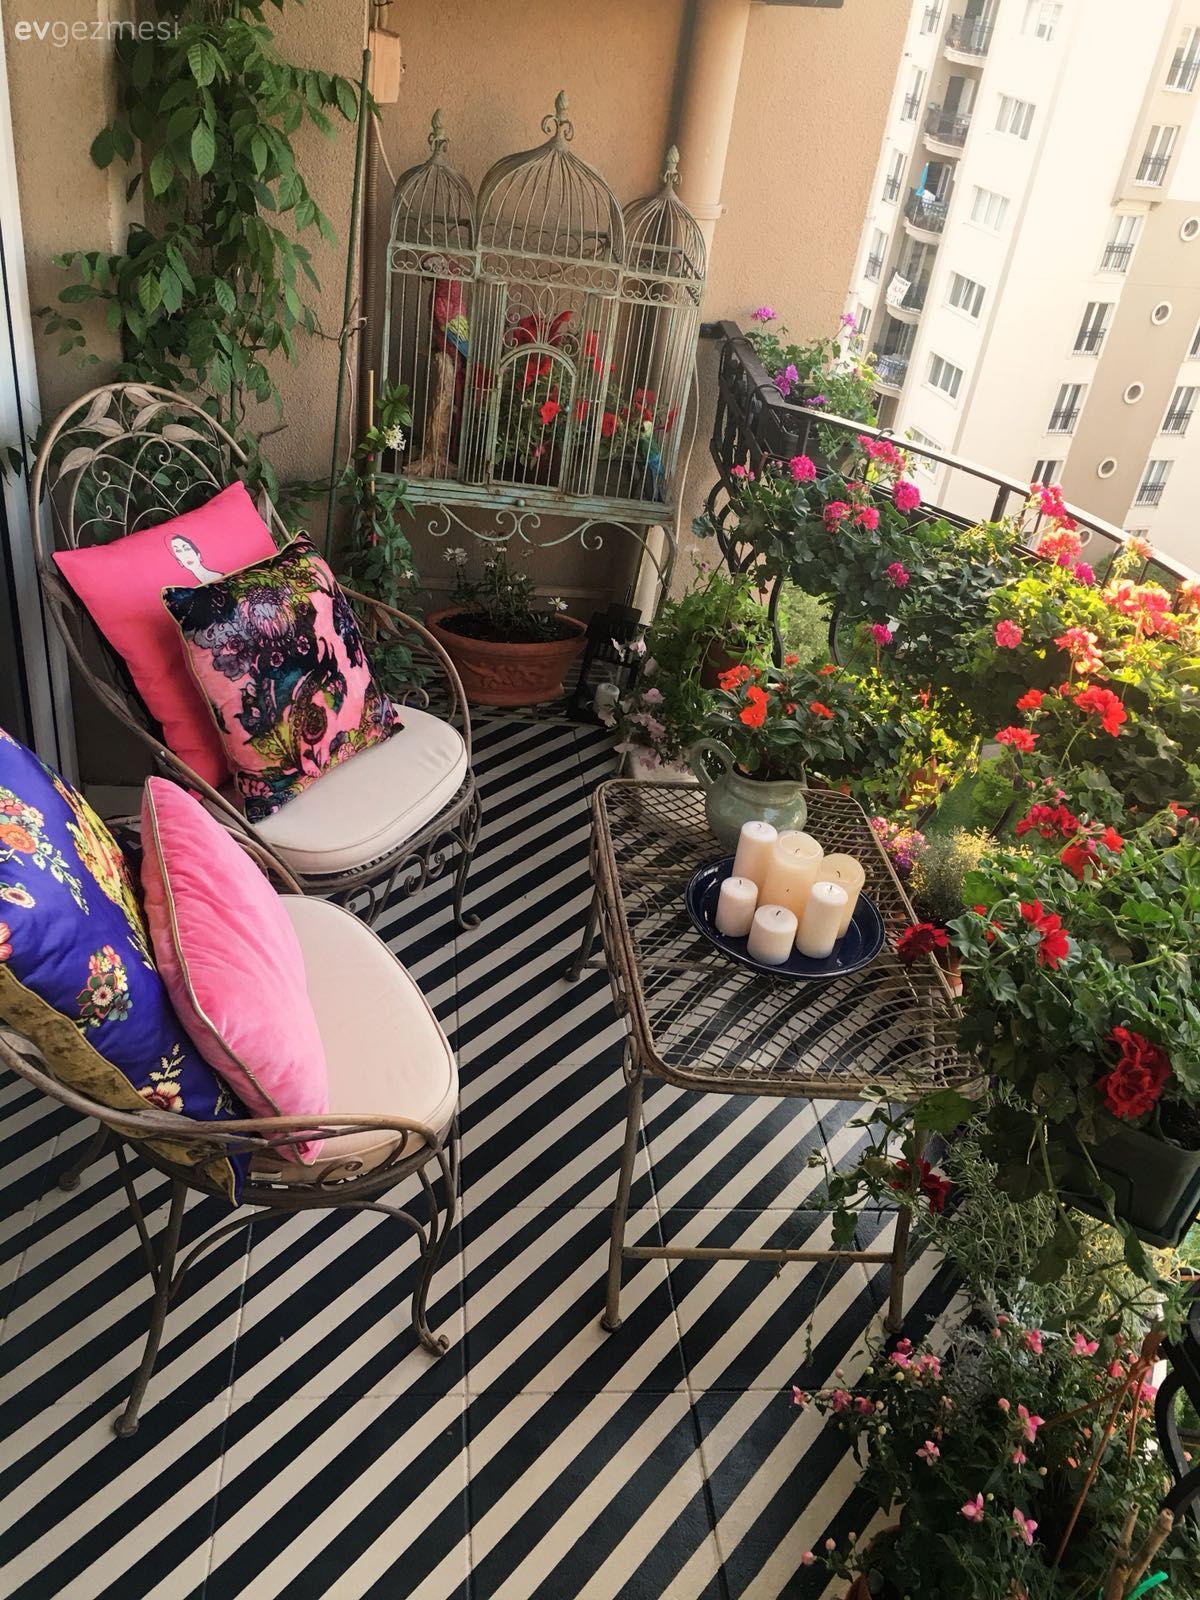 El Emegi Ile Donusen Bu Balkon Cizgili Zemini Renkli Cicekleri Ile